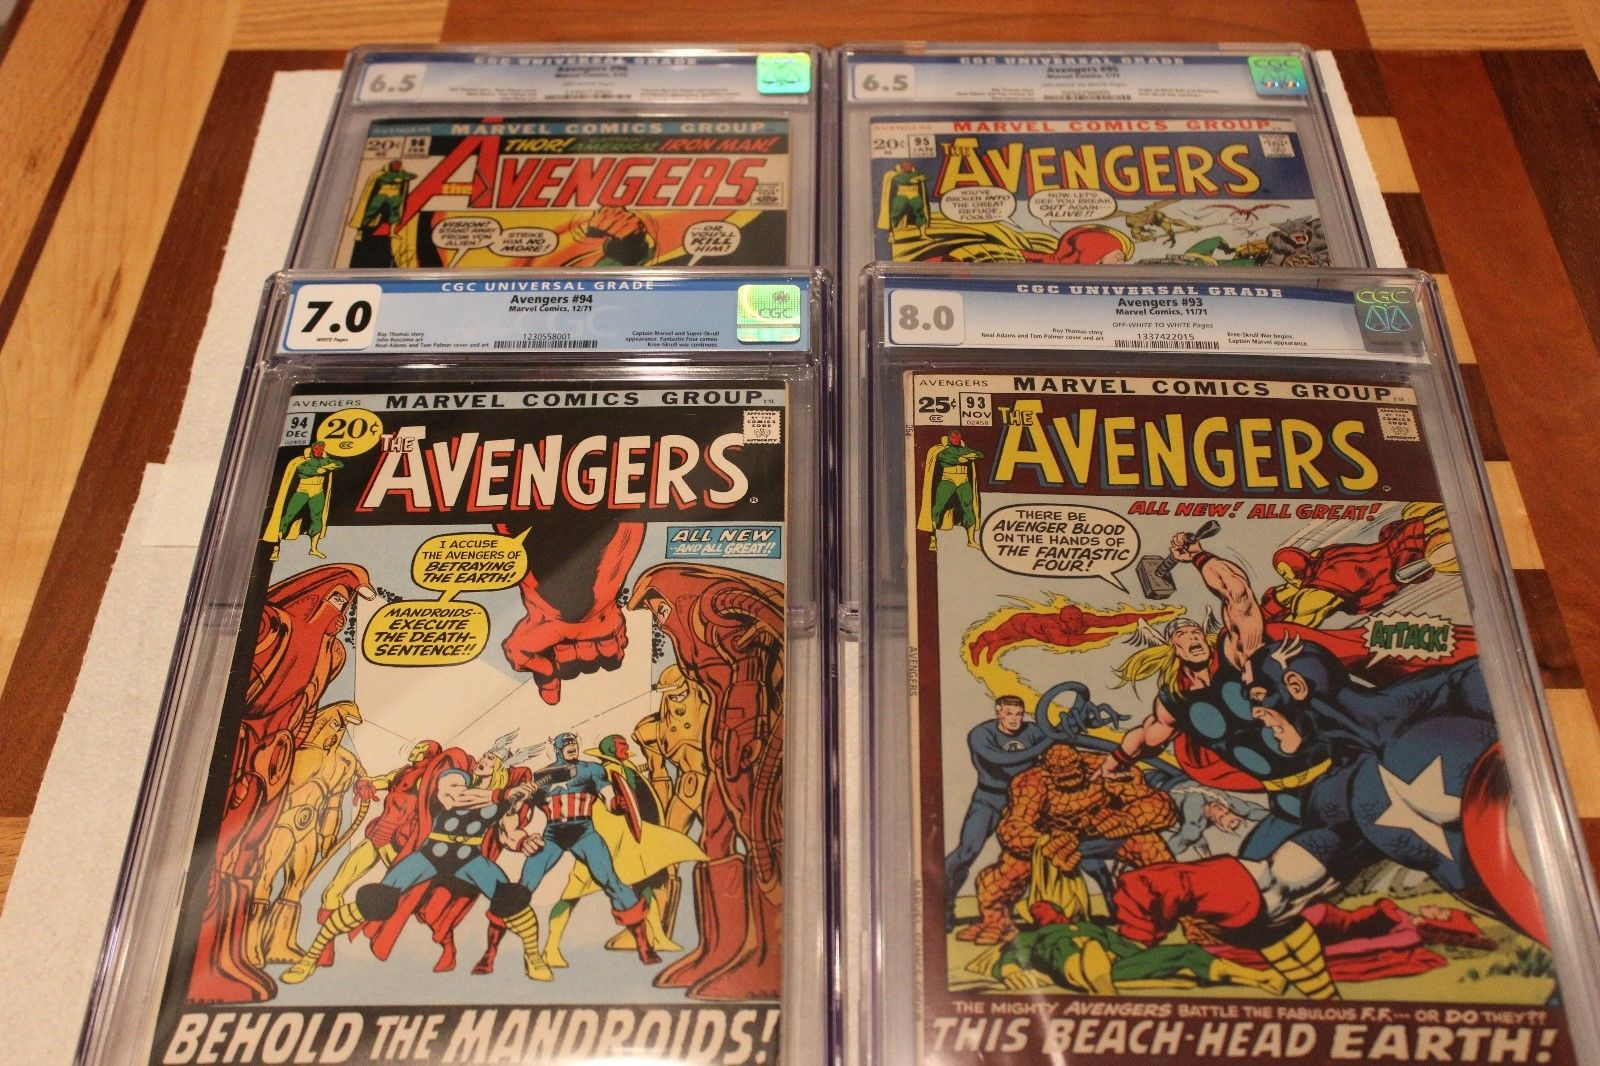 Avengers CGC Lot (4 Books) #93 (8.0), #94 (7.0), #95 (6.5), #96 (6.5) Neal Adams